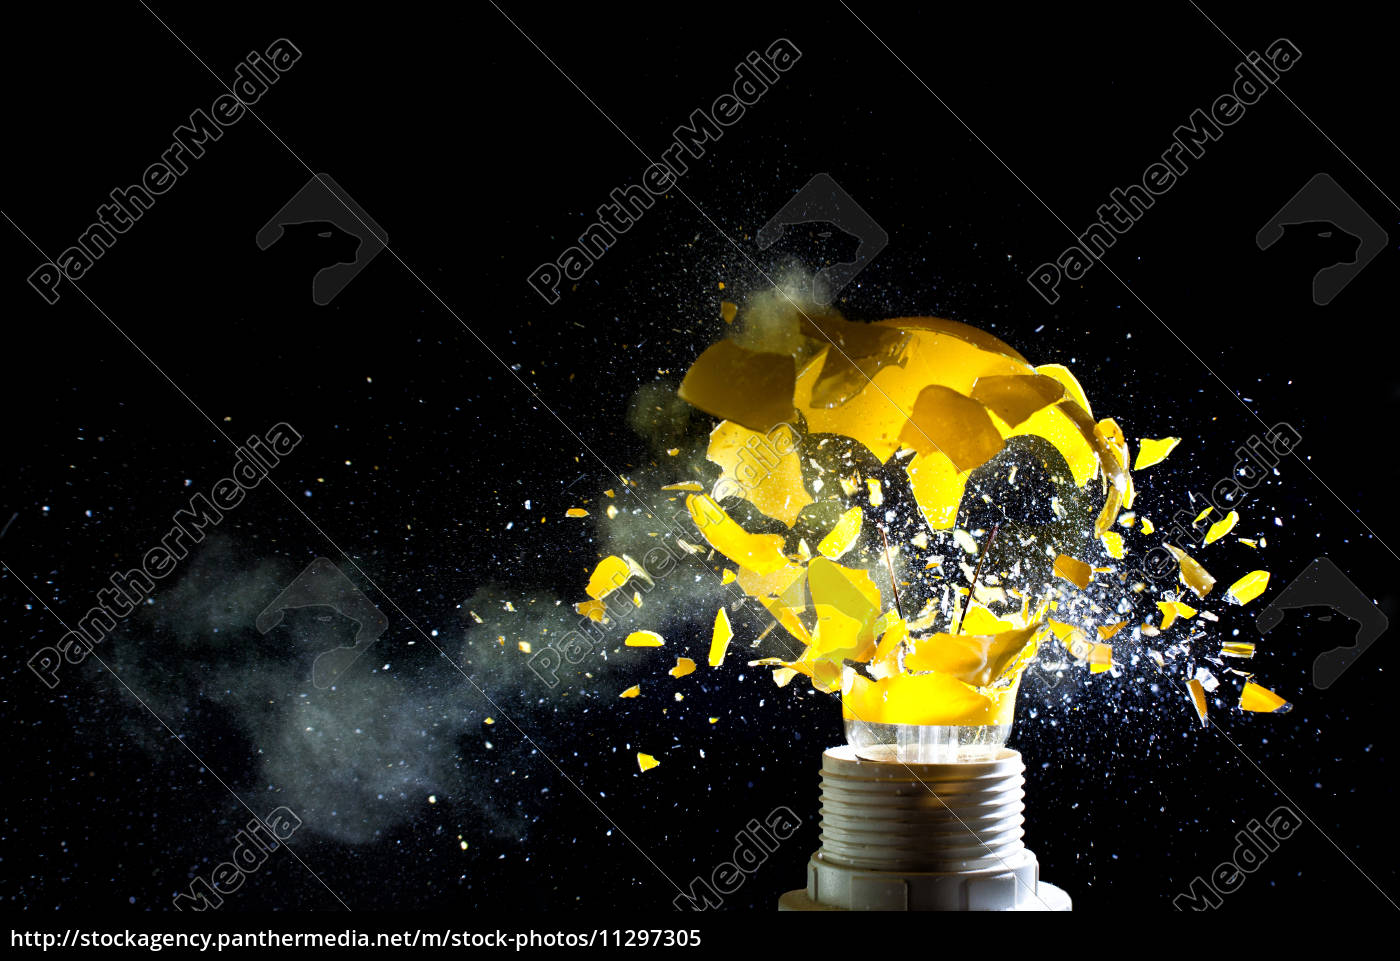 lampe, explosion - 11297305